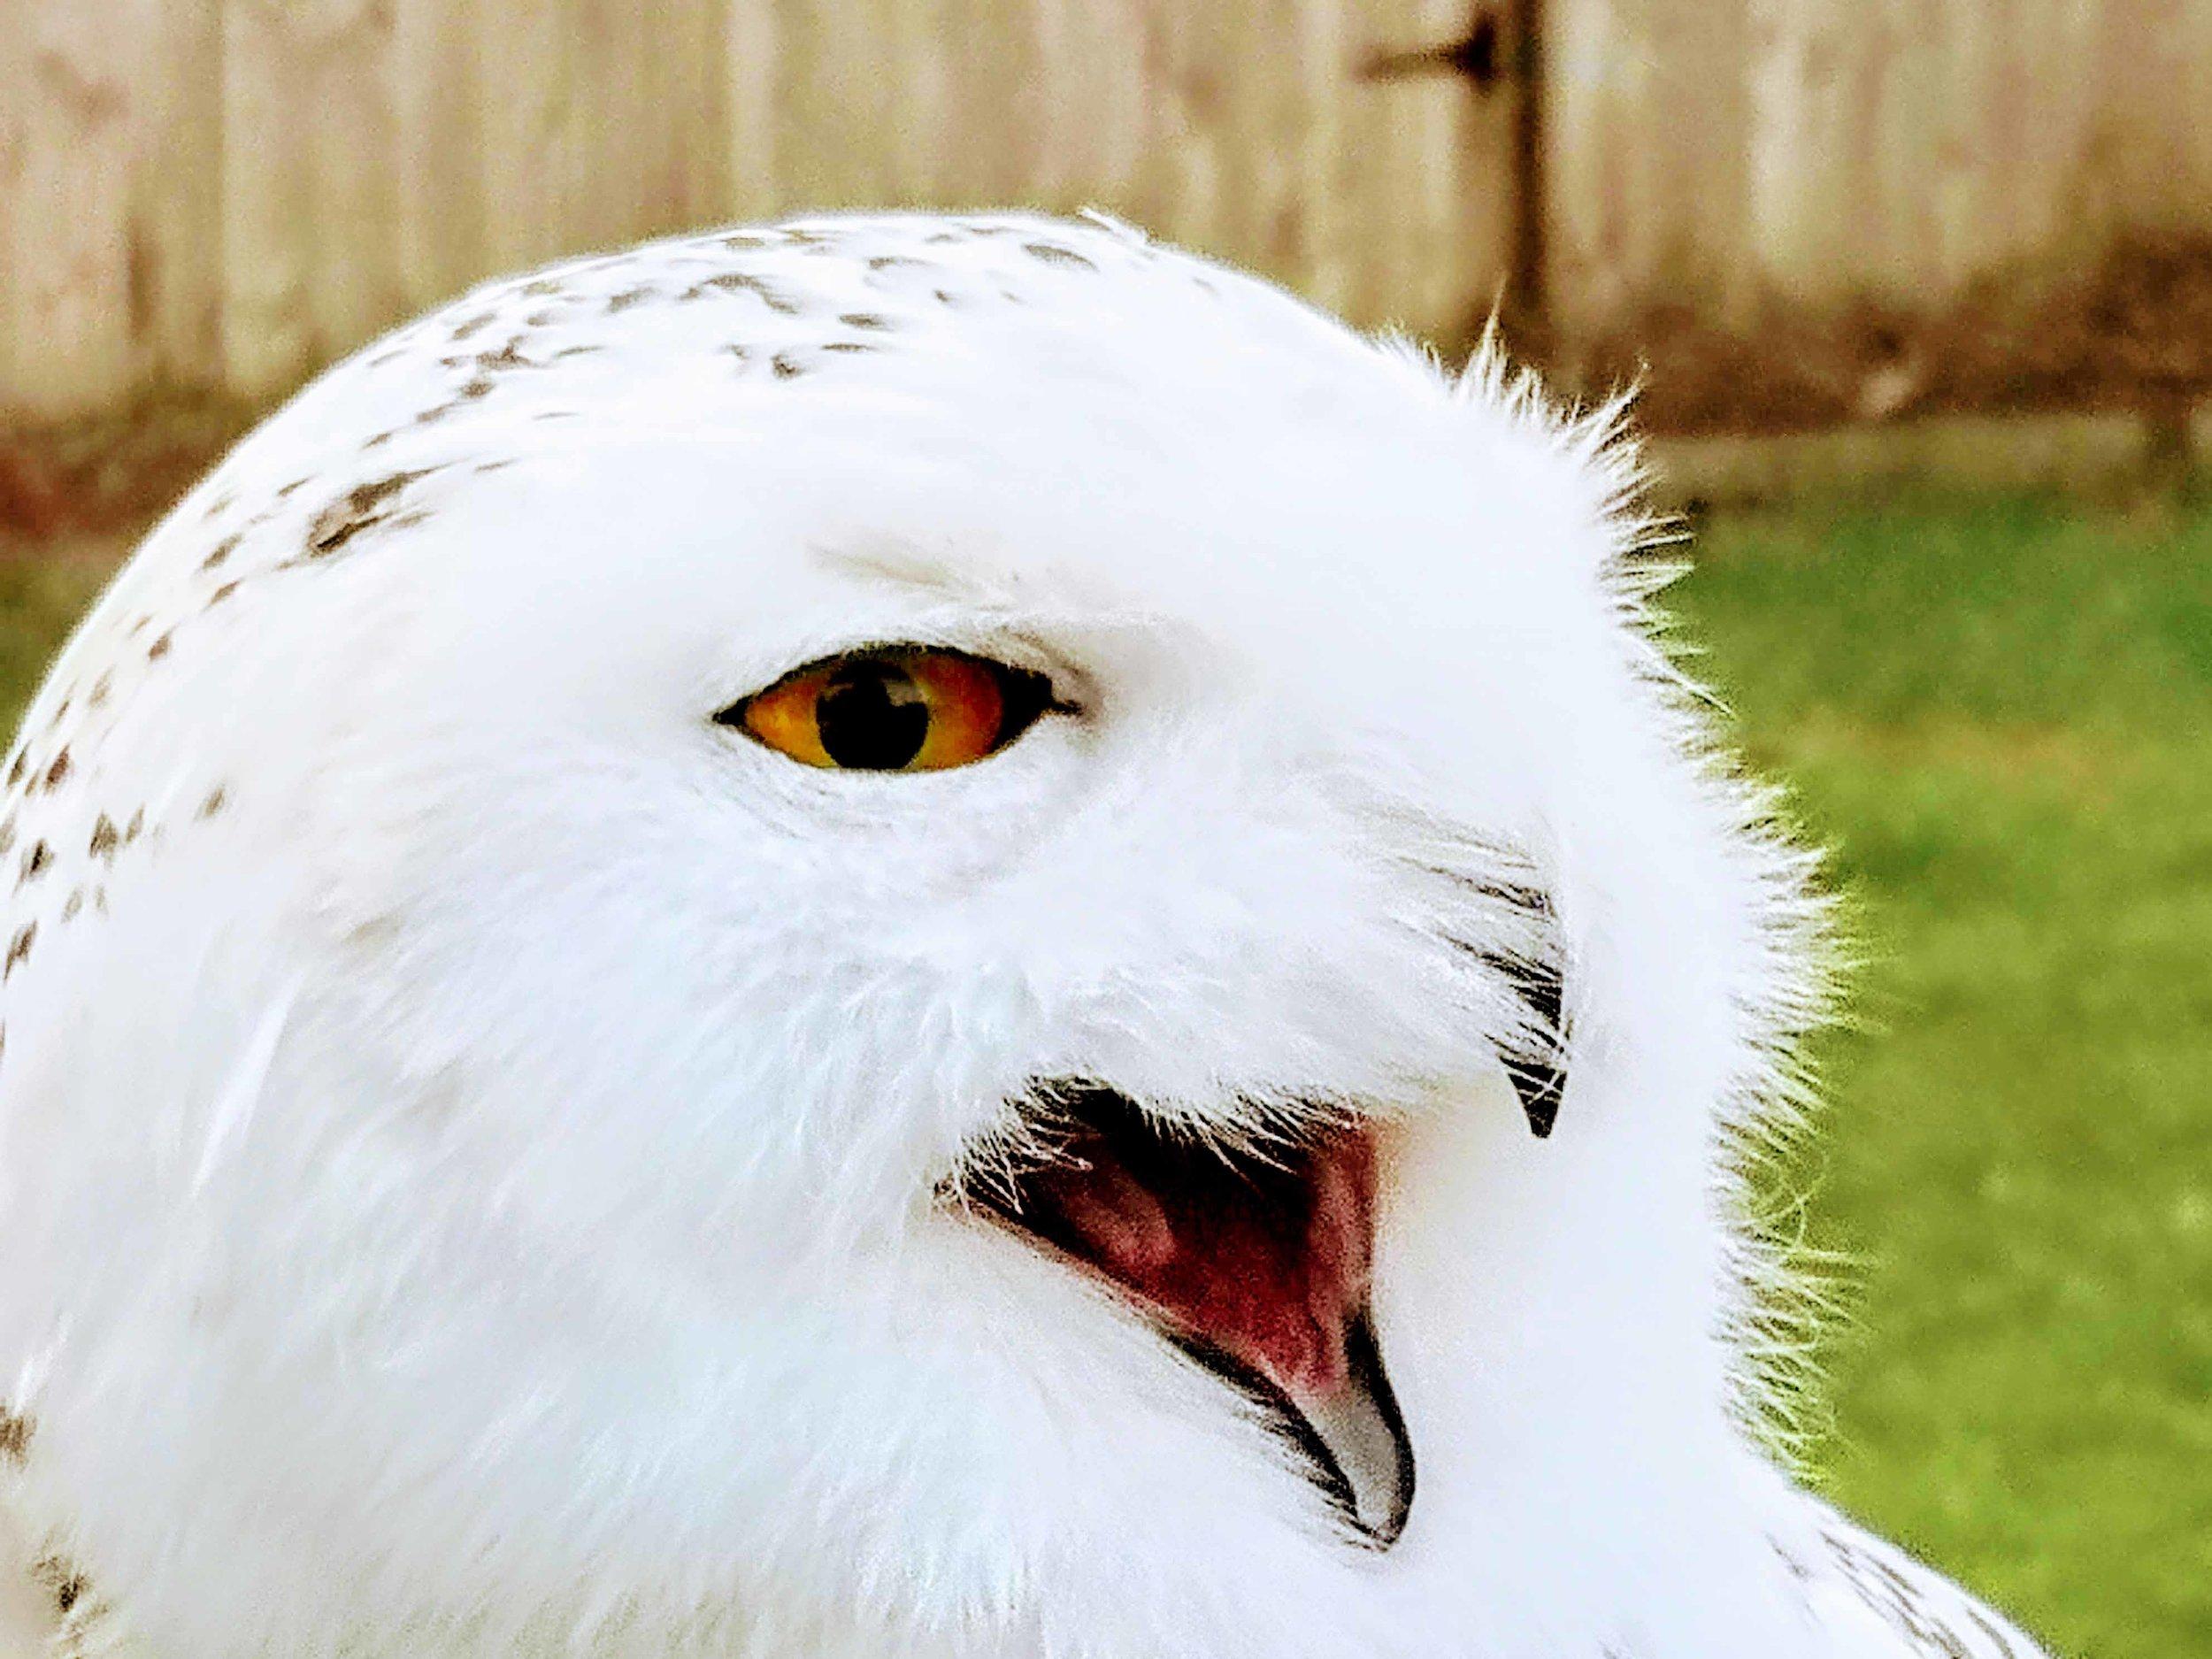 Argyll adult head and beak open.jpg